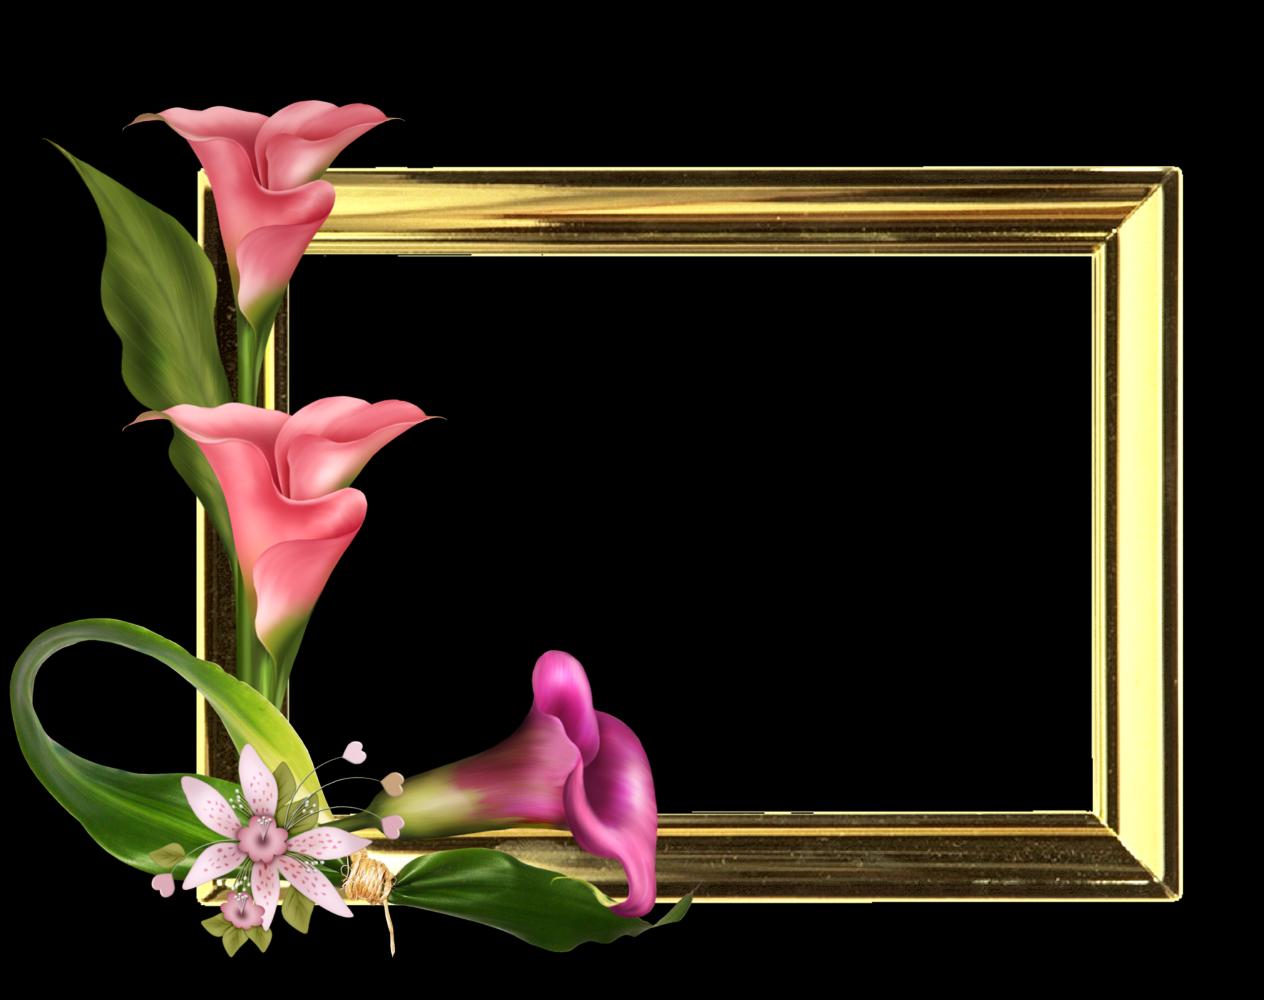 Resultado De Imagen Para Tarjetas Para Aniversarios De Difuntos Flower Frame Paper Background Background For Photography